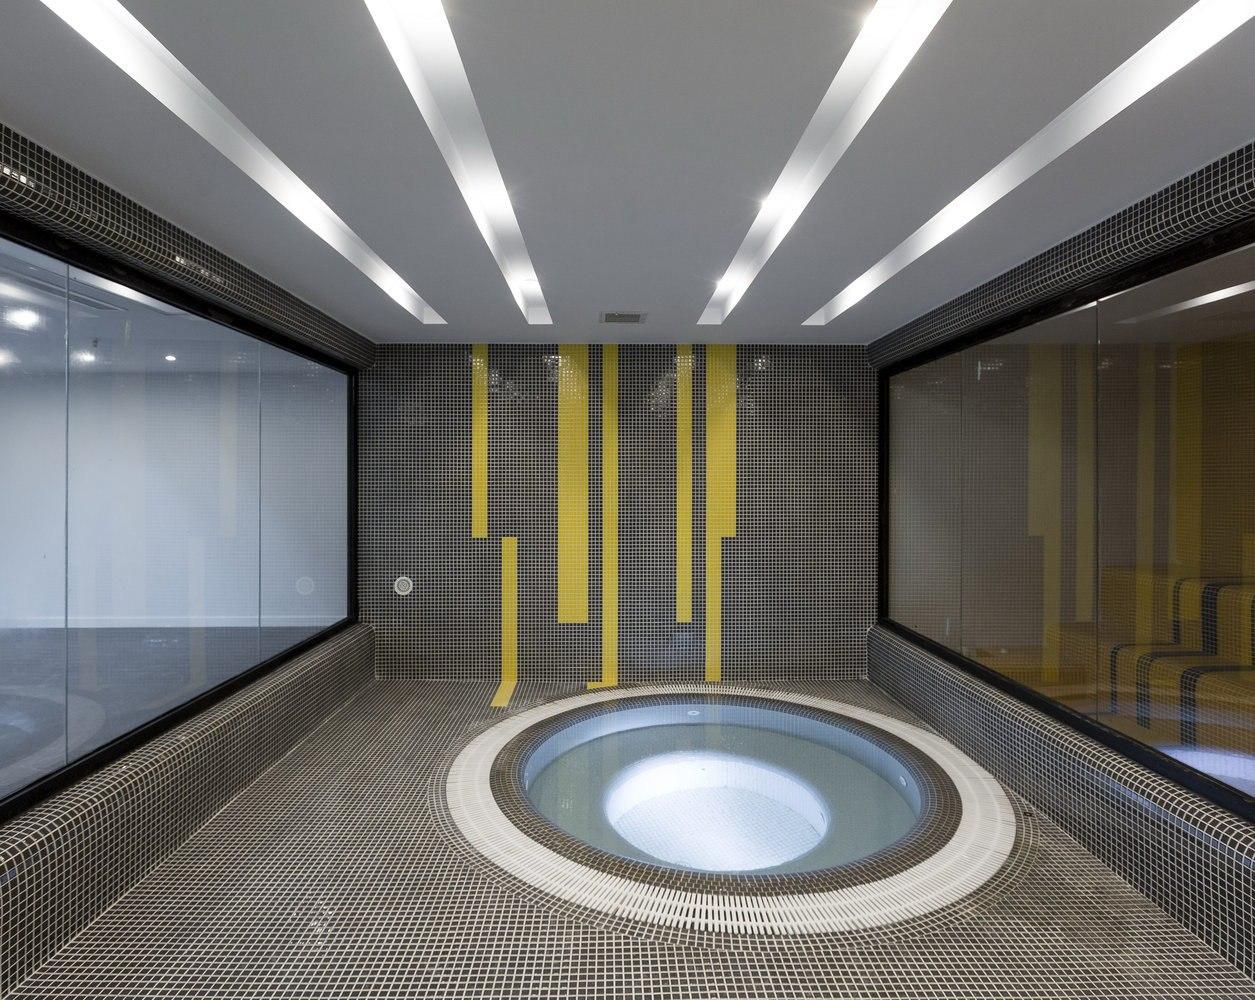 Park Residential / Behzad Atabaki Studio